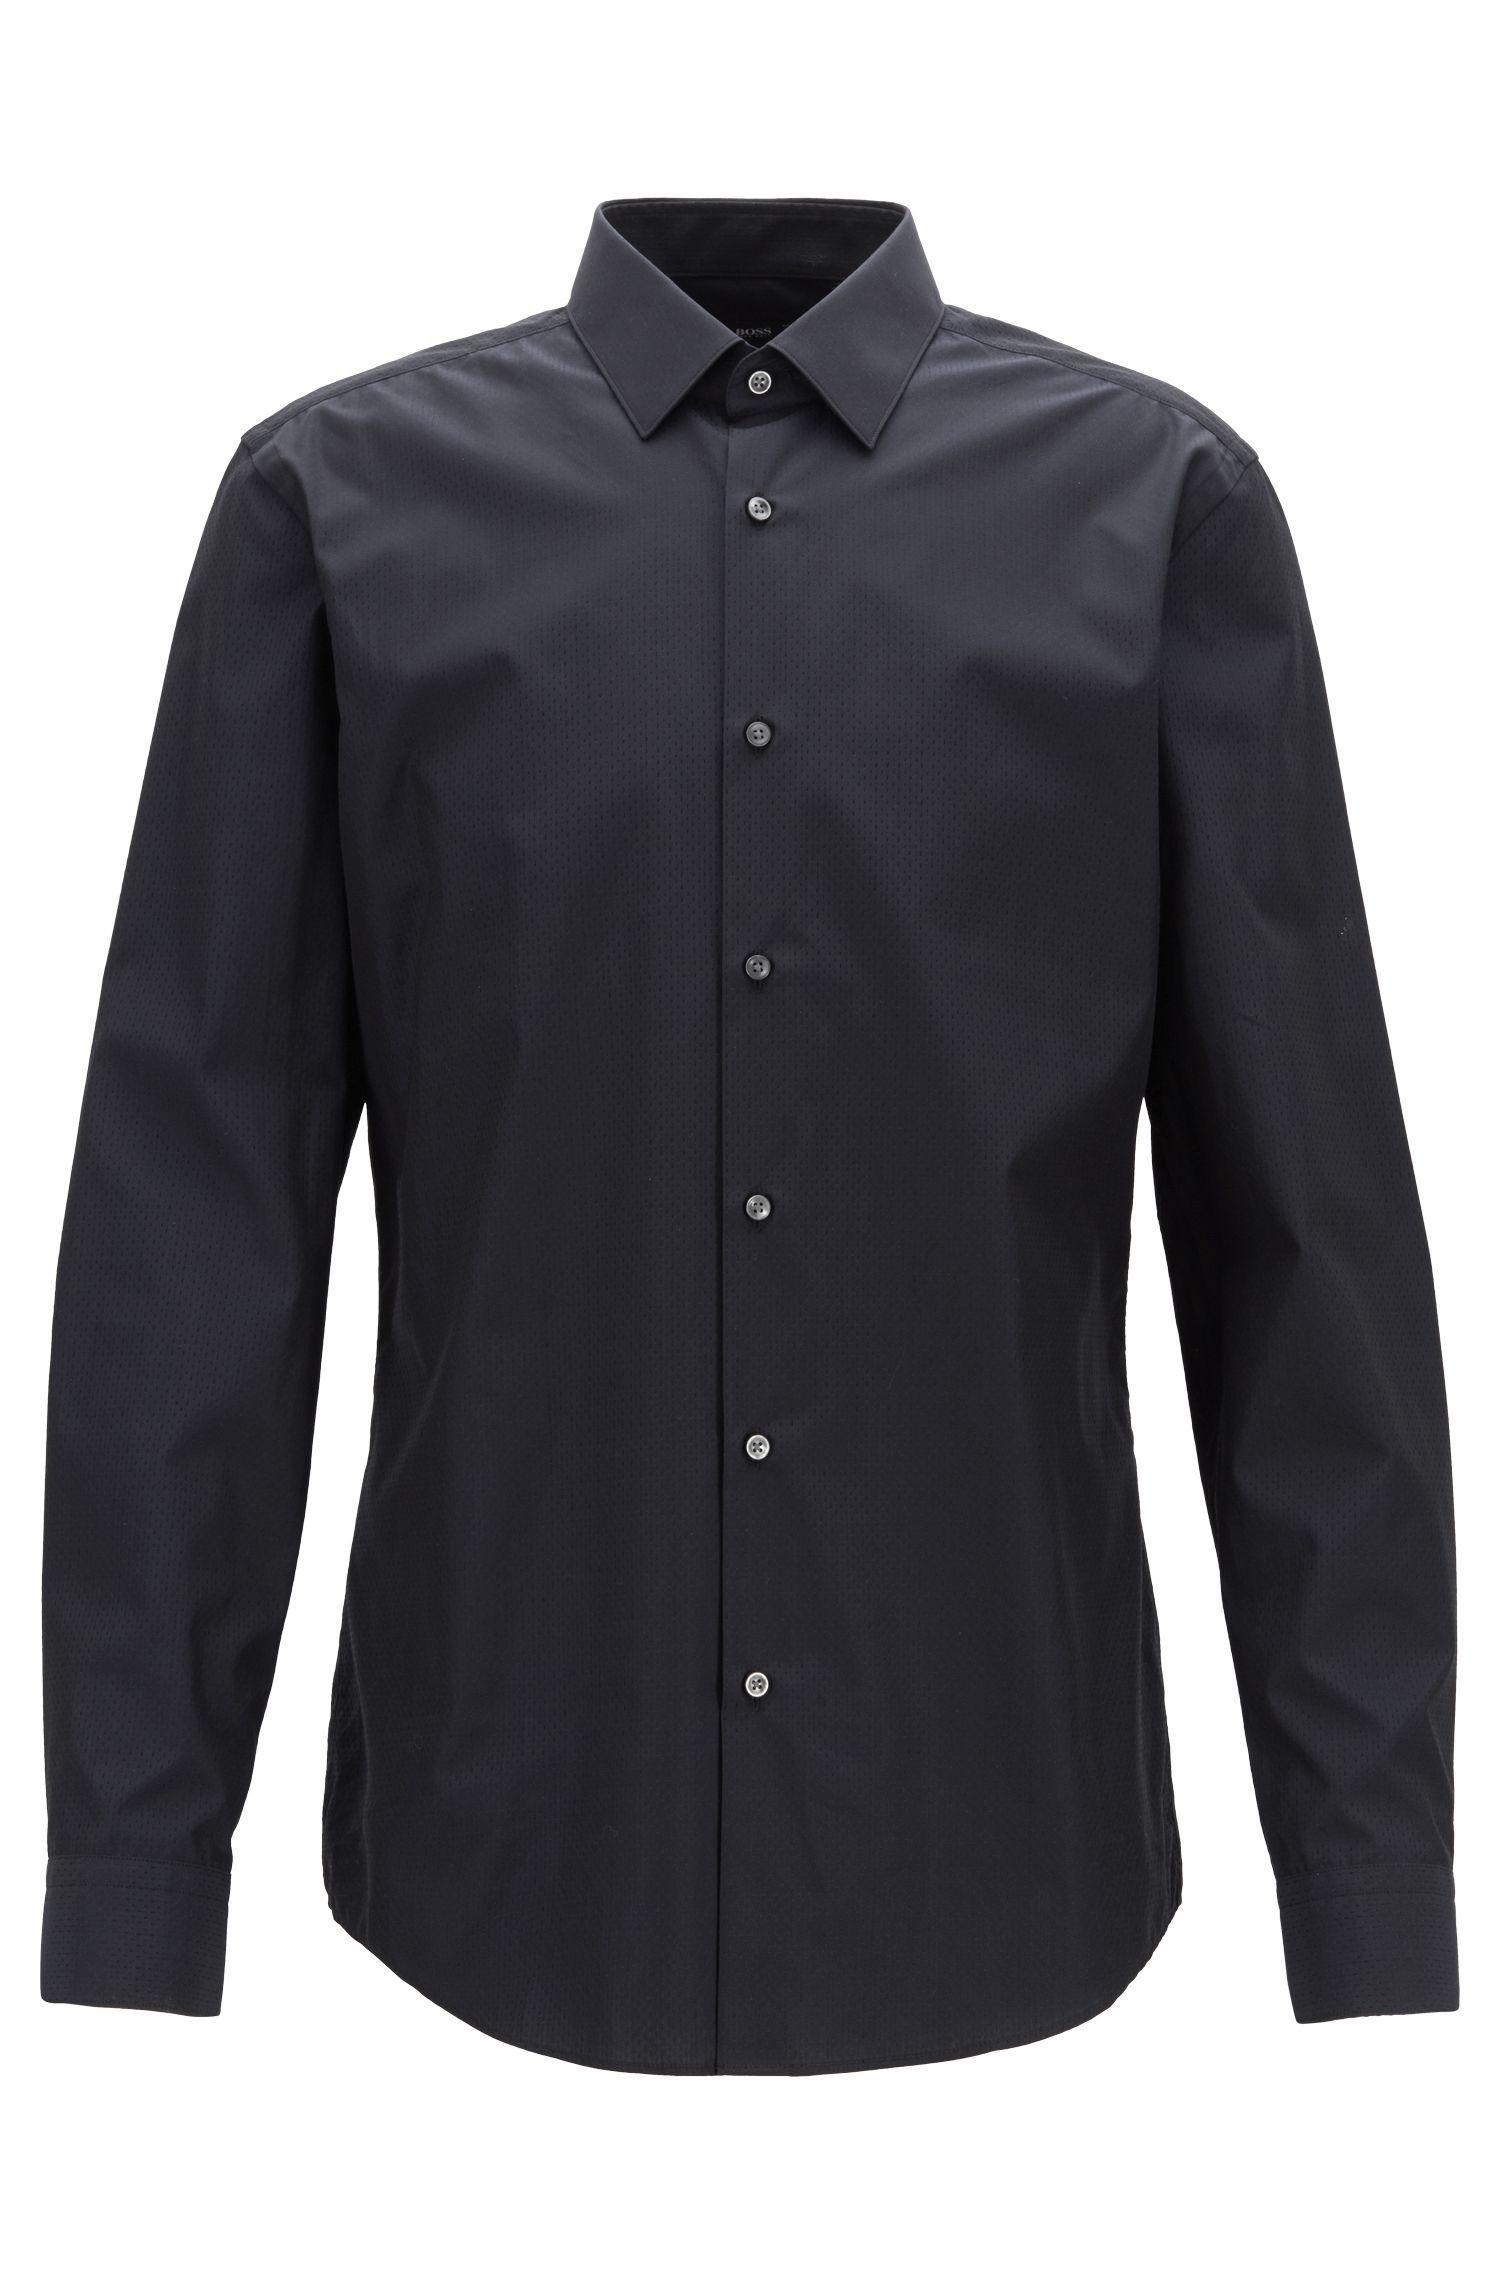 2fbe0756 Lyst - Boss Slim-fit Shirt In Dobby Egyptian Cotton in Black for Men